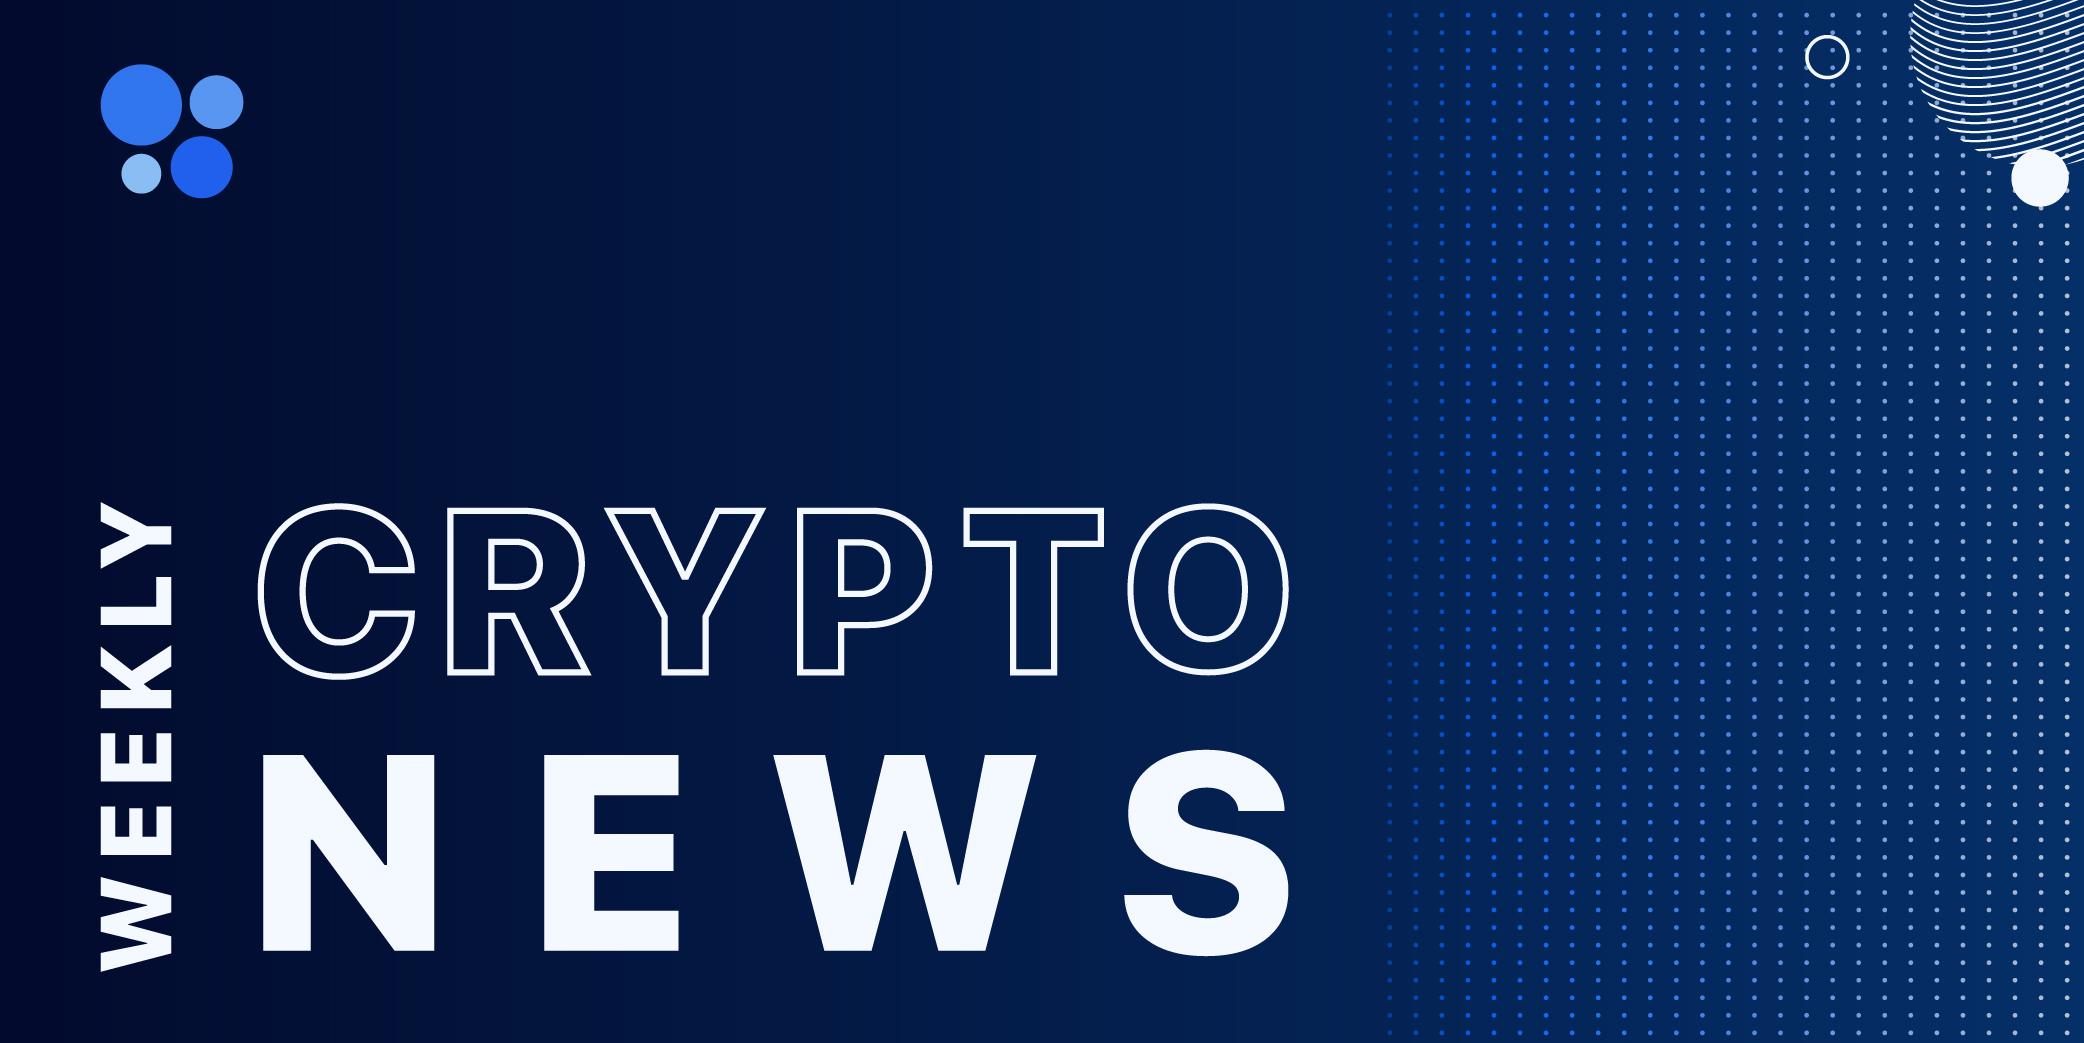 Weekly Crypto News Roundup